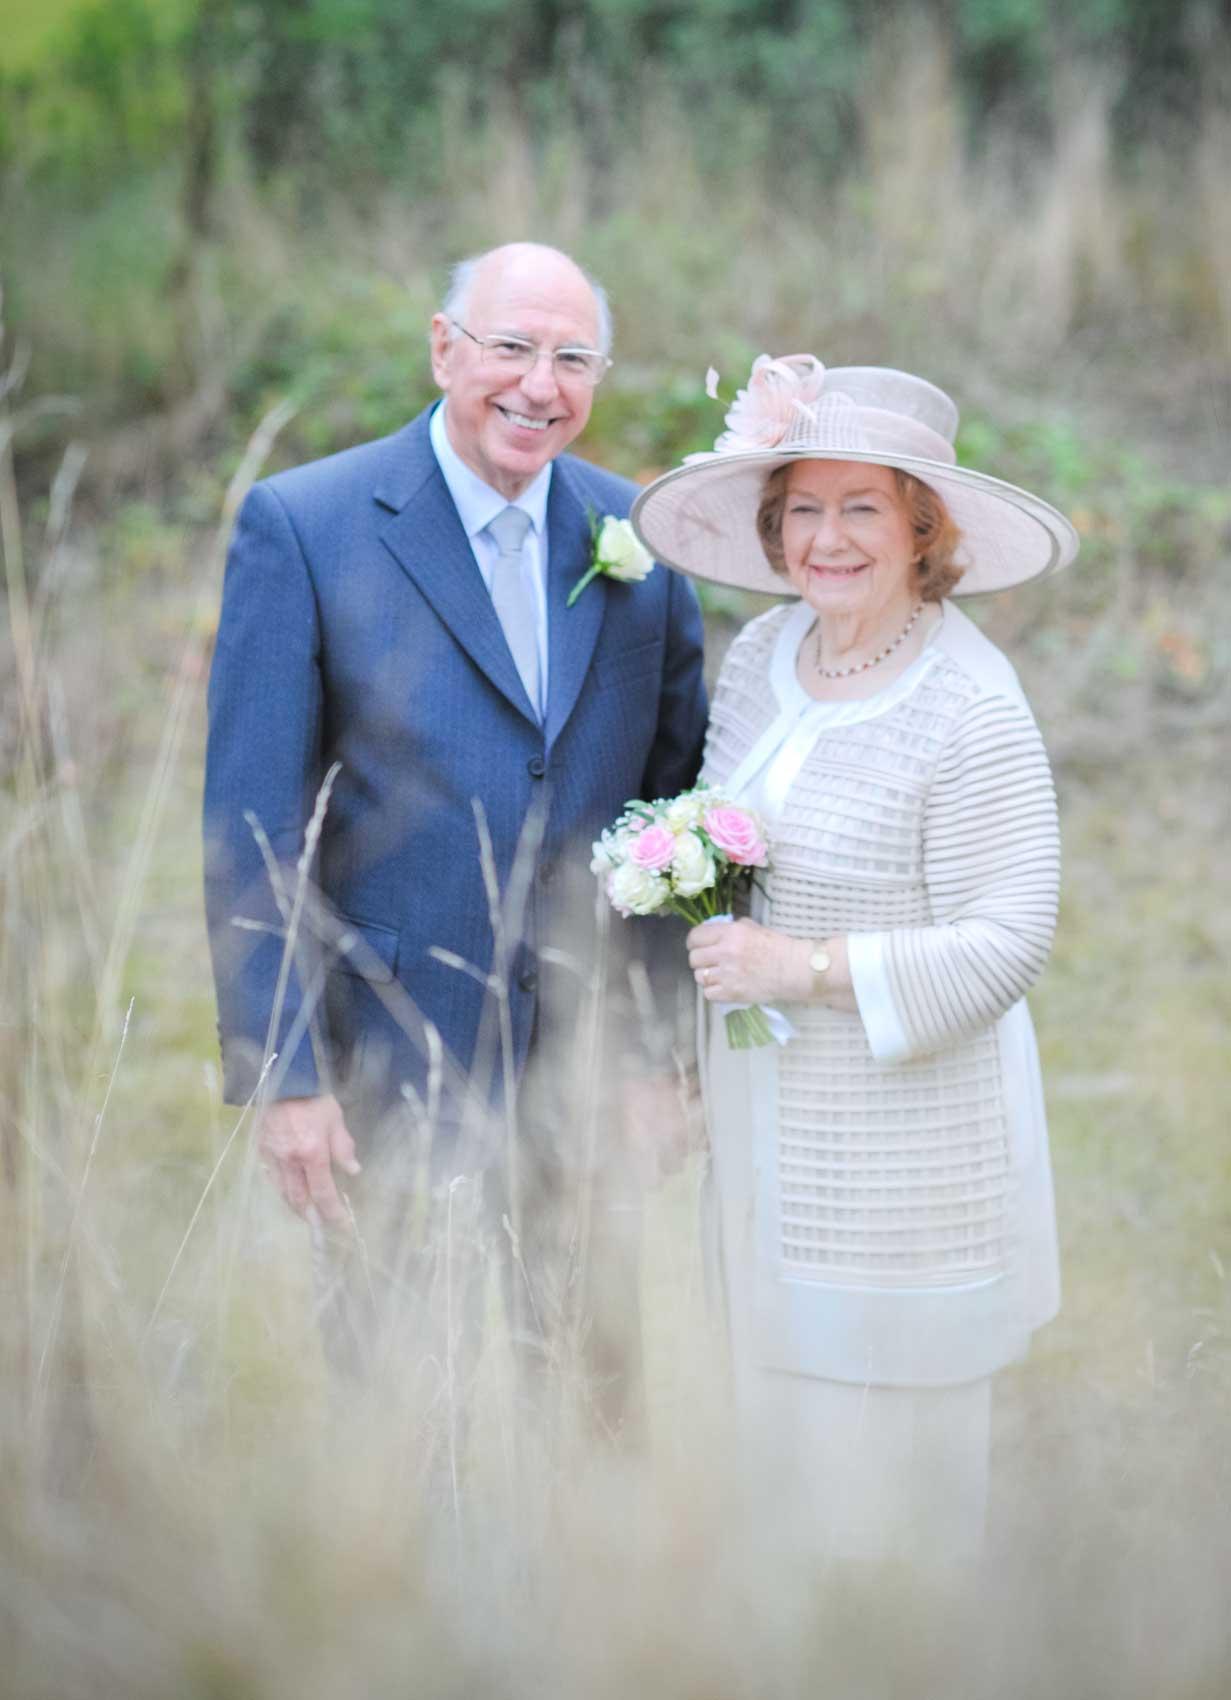 Warbrook House Wedding Photography Ederly Couple